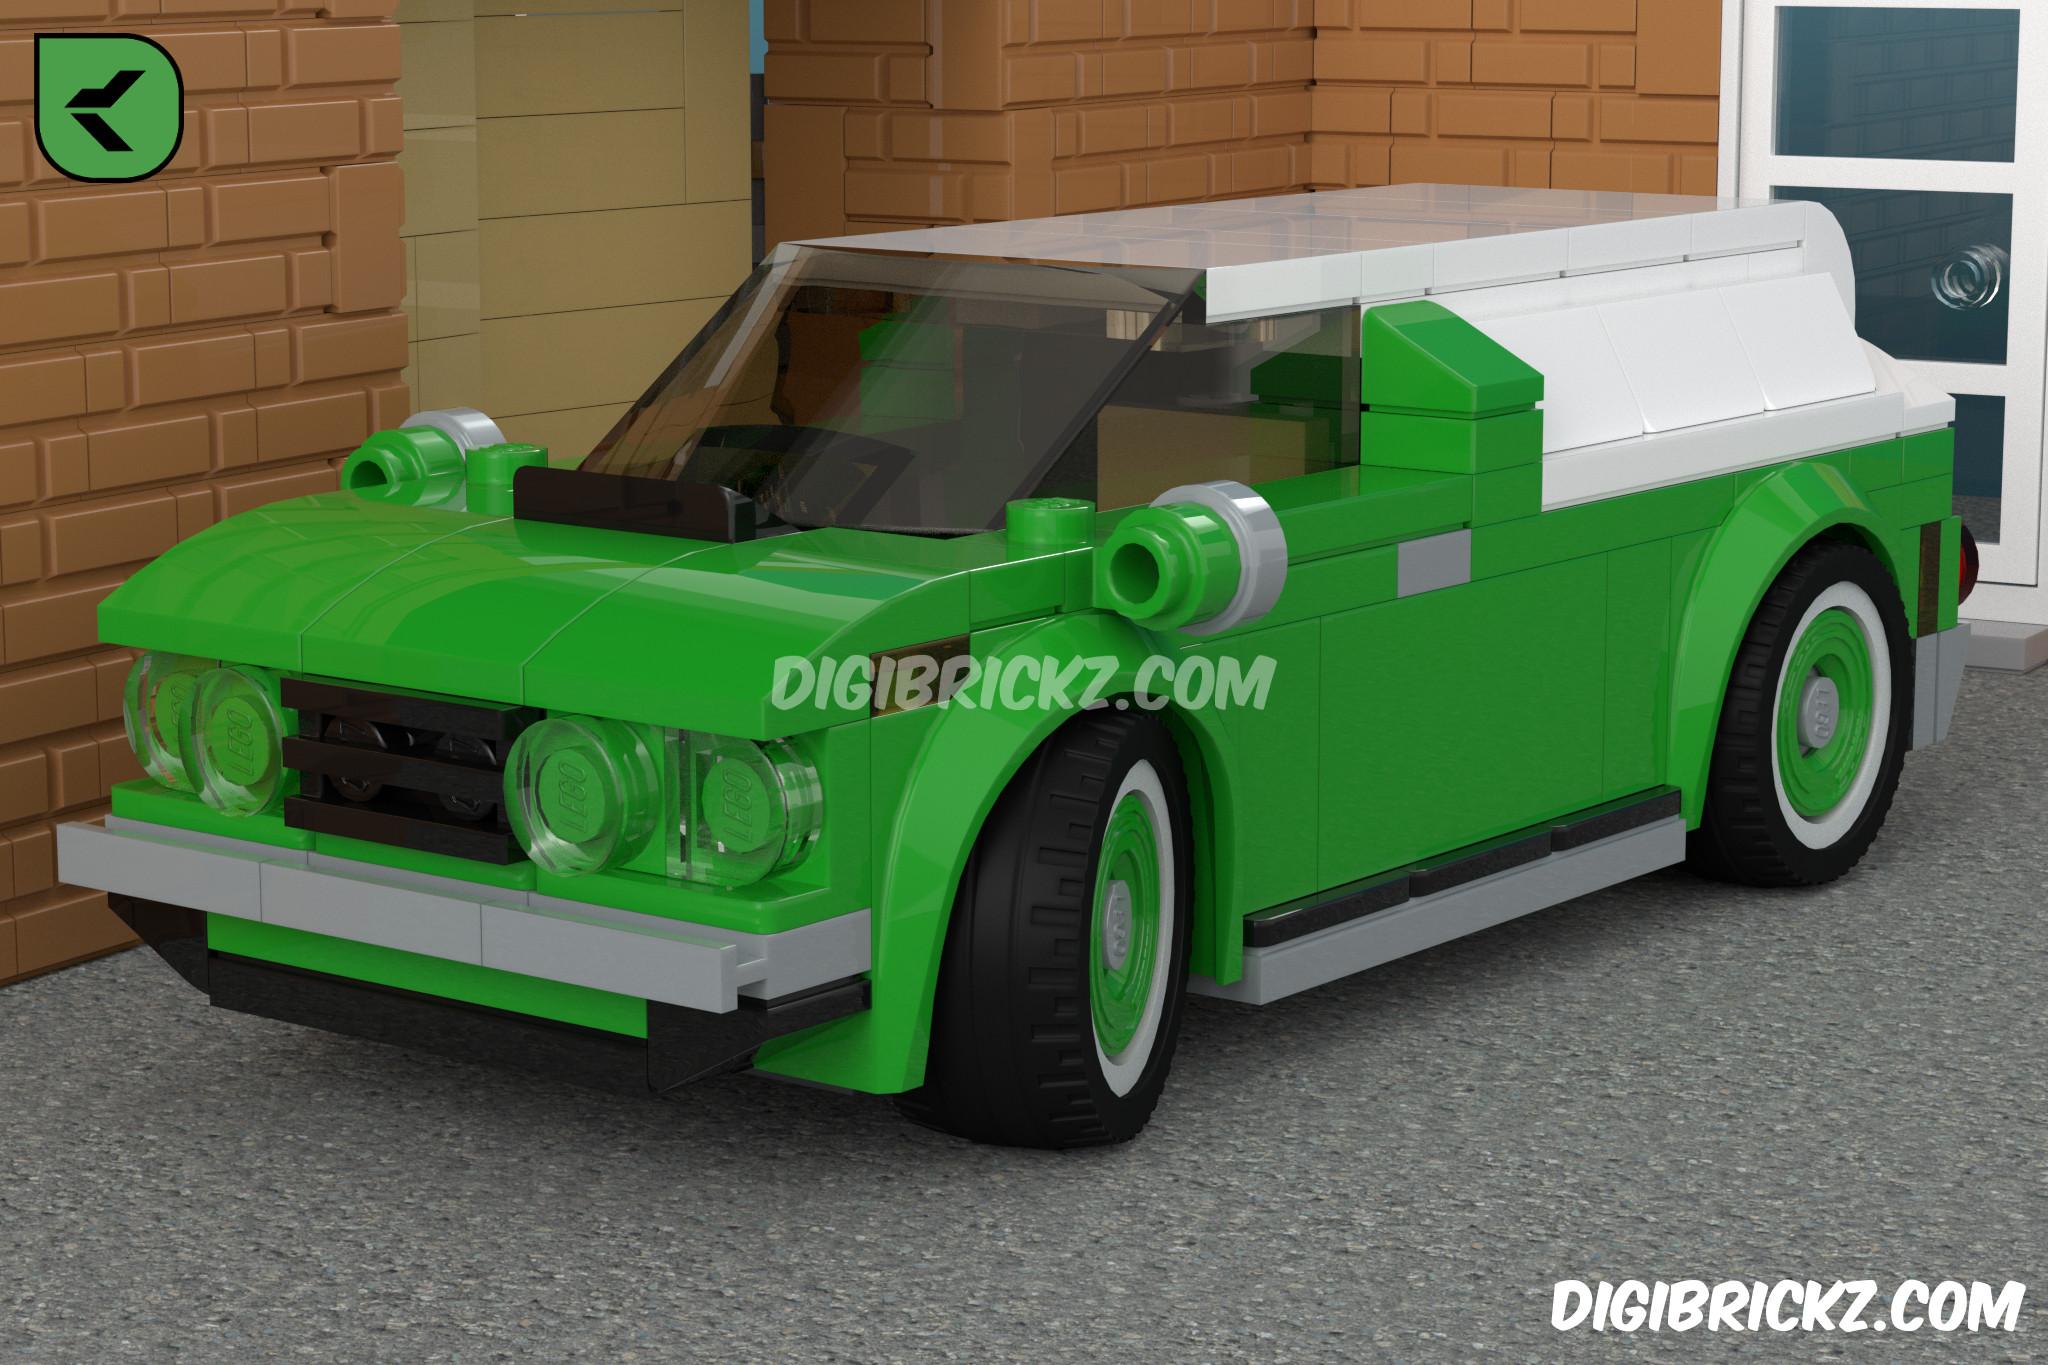 LEGO Delivery Van by Kamal Muftie Yafi (KamalMYafi/Kamteey) | DigiBrickz.com